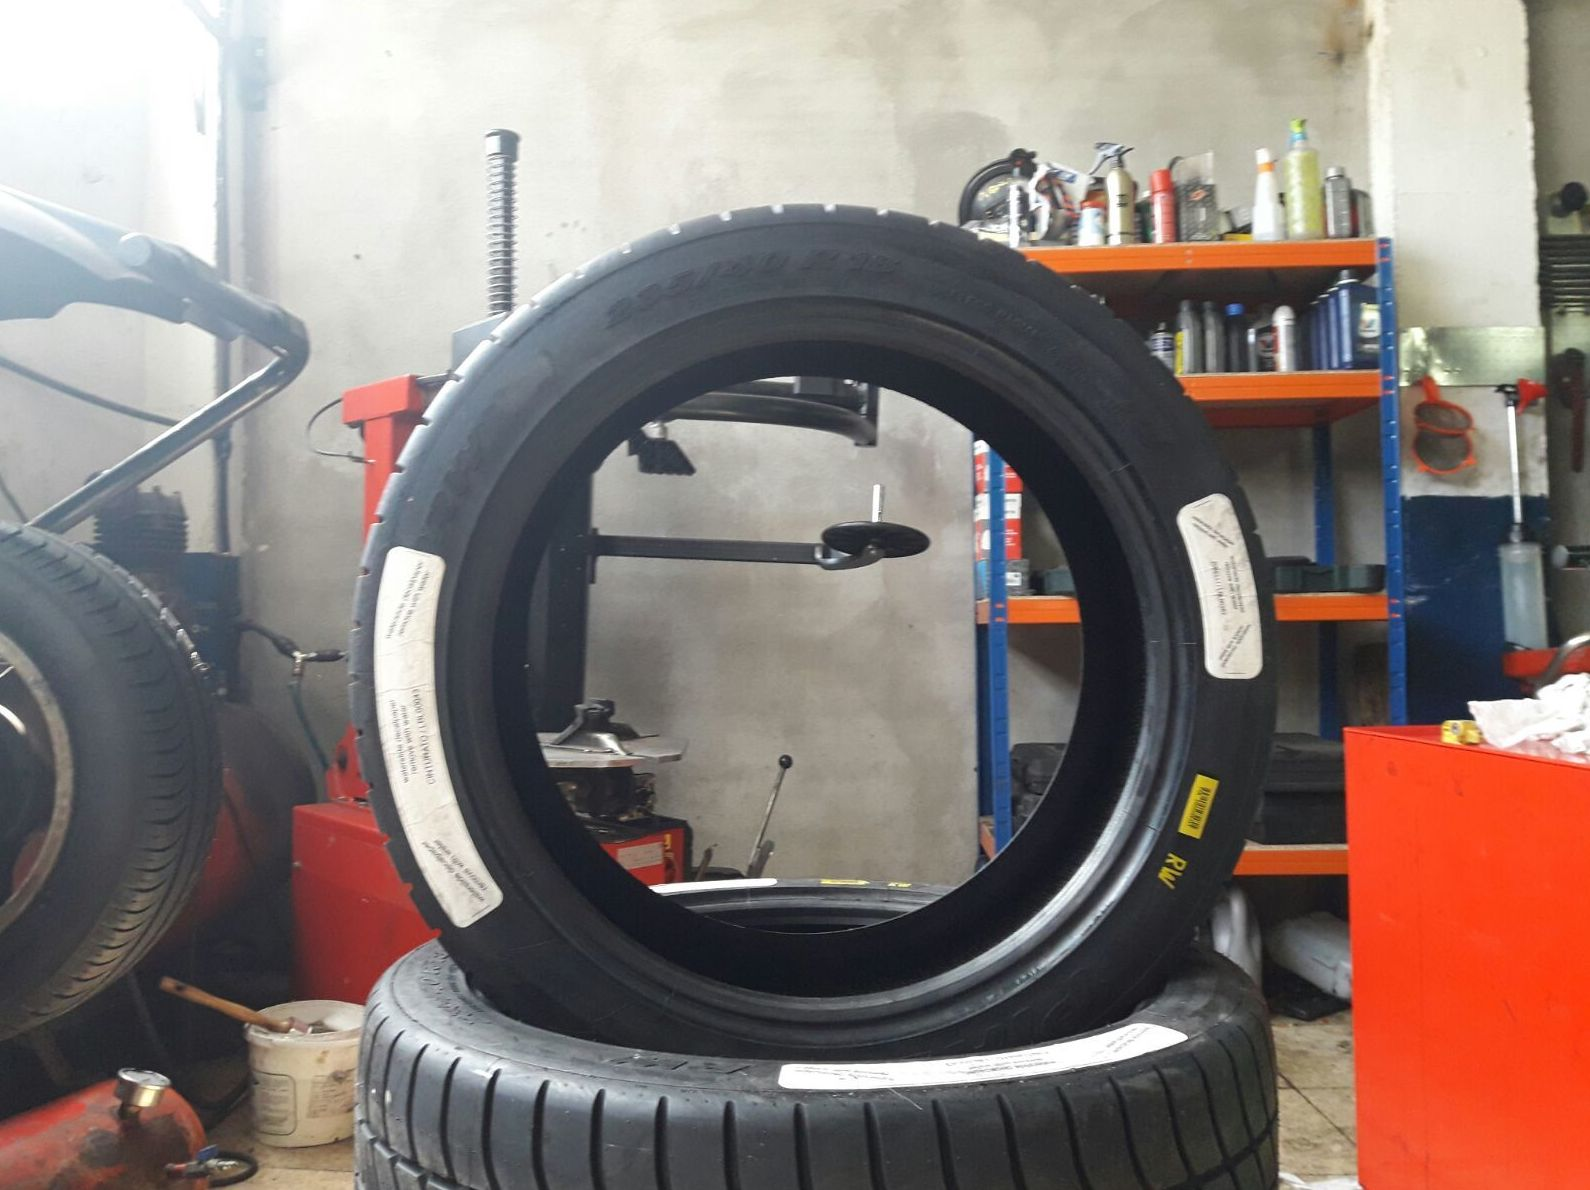 Neumáticos: Servicios de NEUMÁTICOS MIKEL